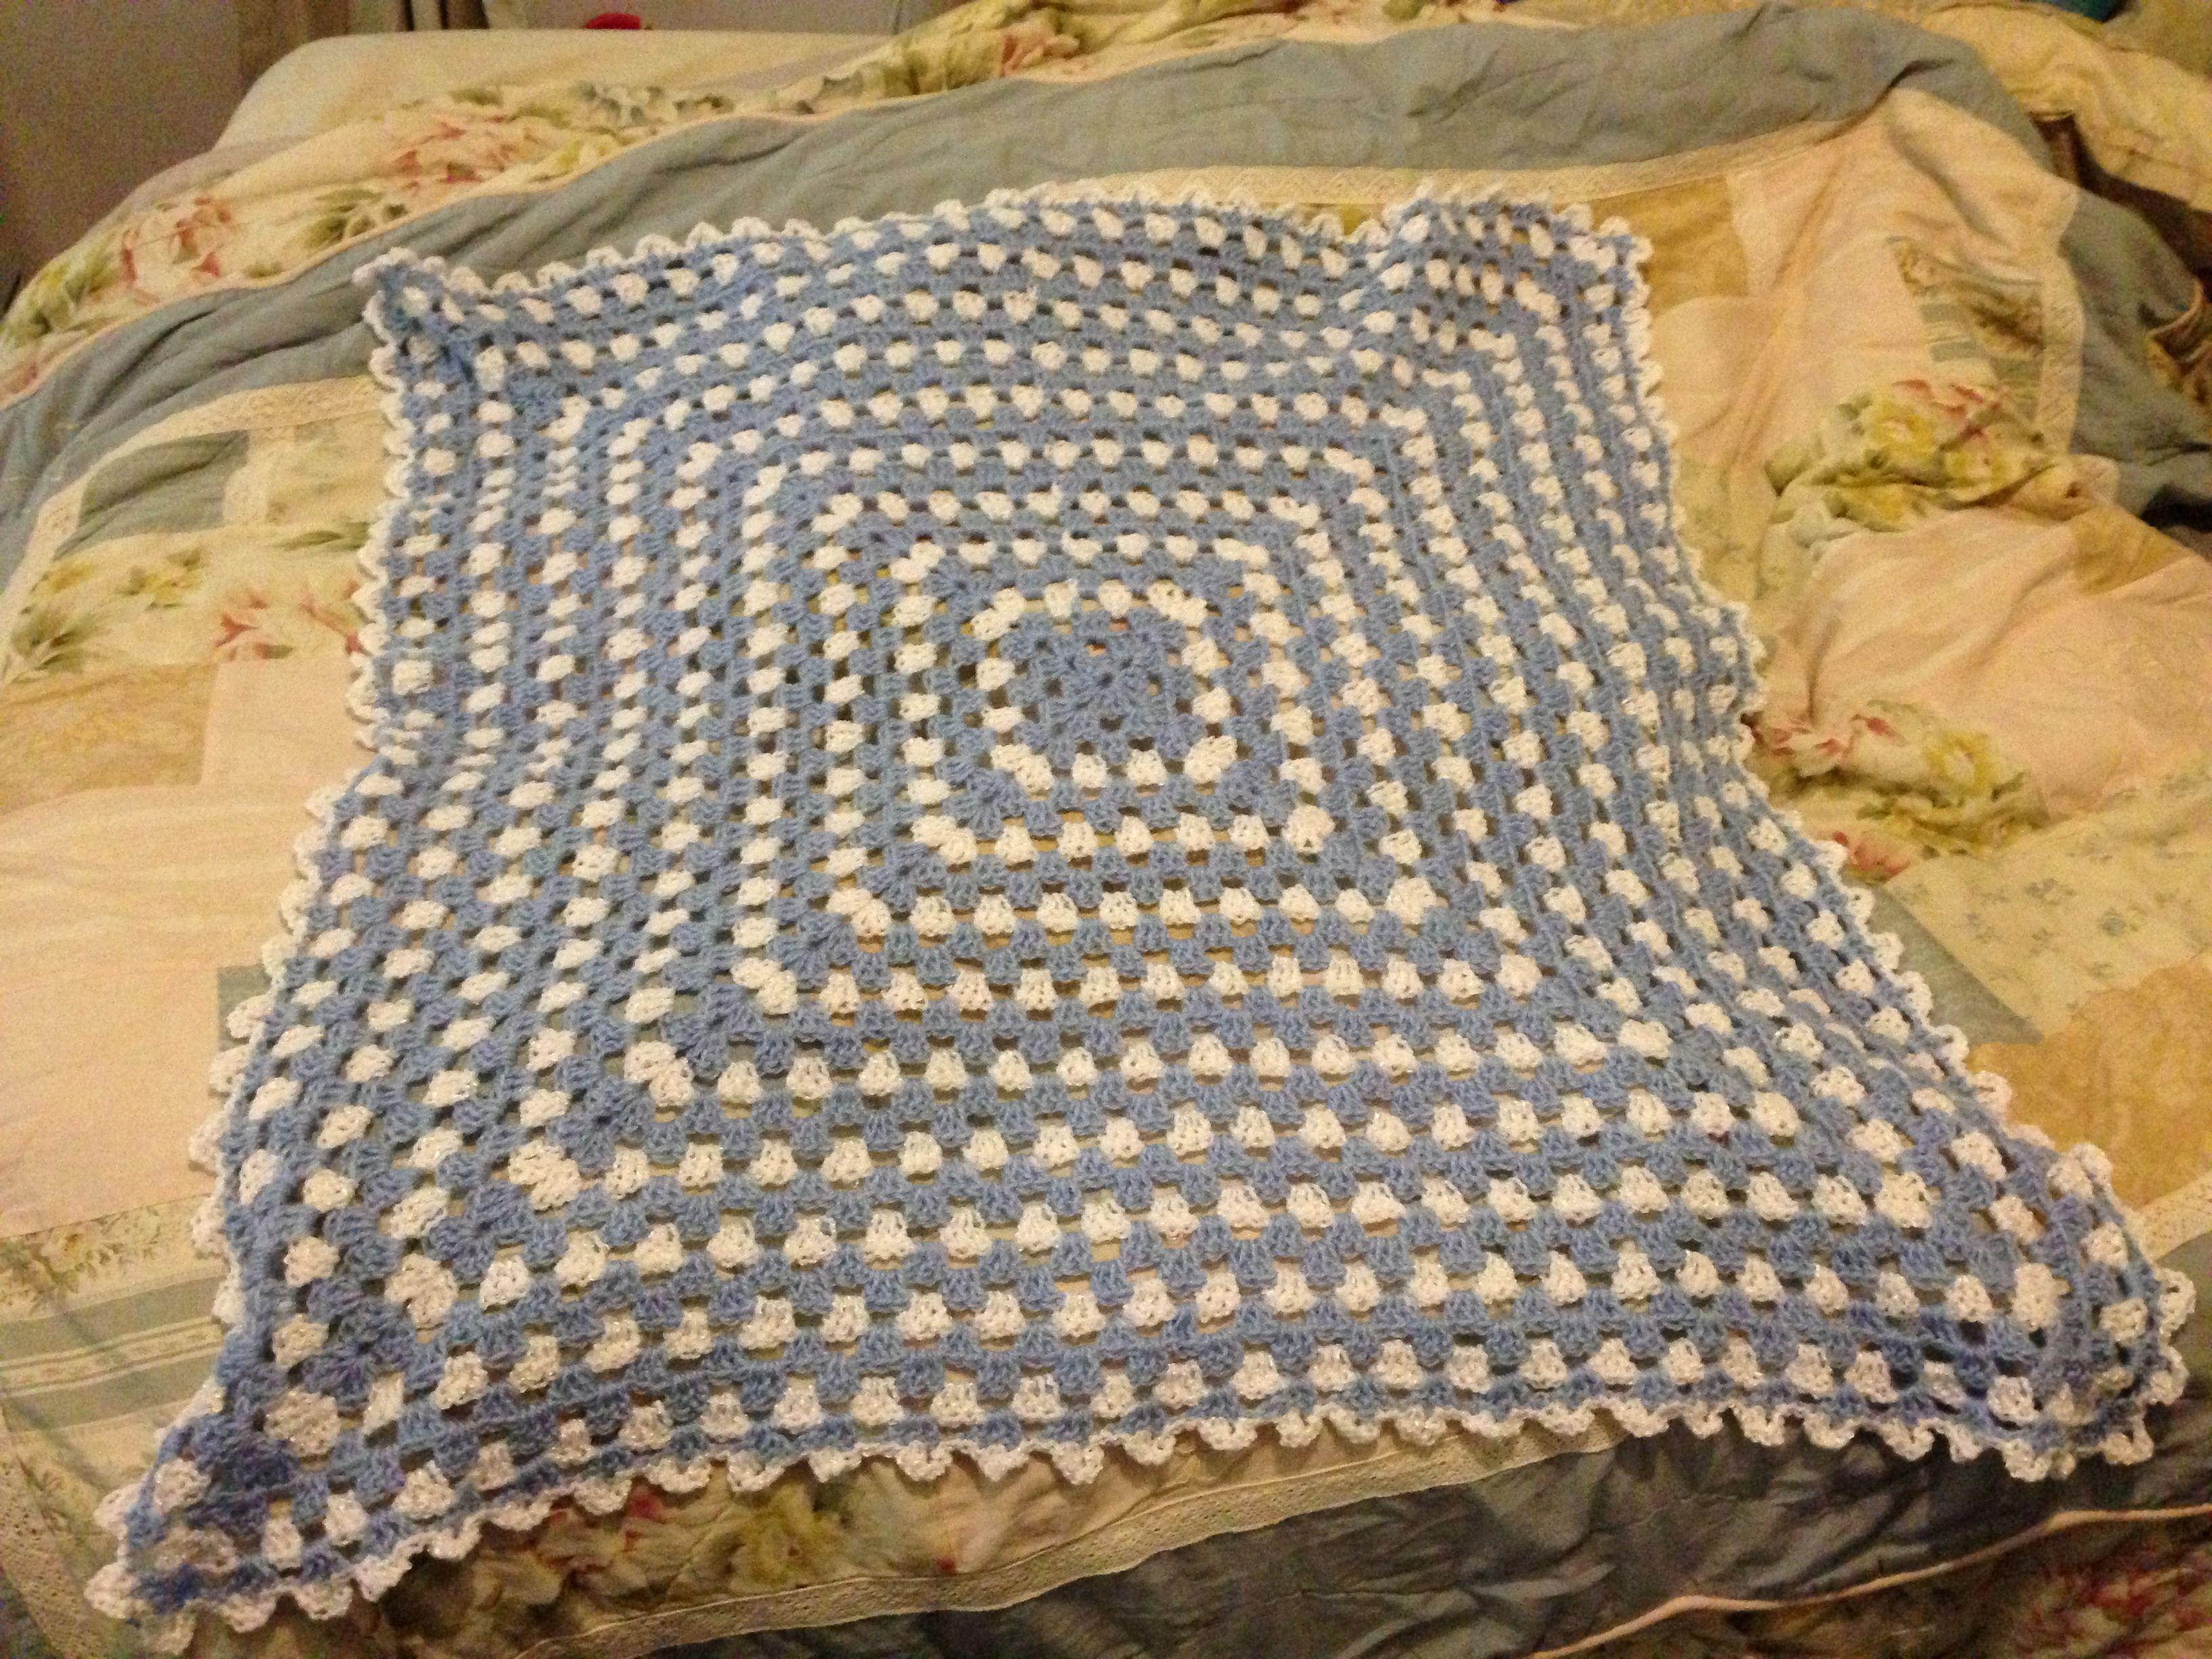 Crochet Caterpillar Baby Blanket Pattern : Baby blanket I crocheted CATs Crochet Creations Pinterest